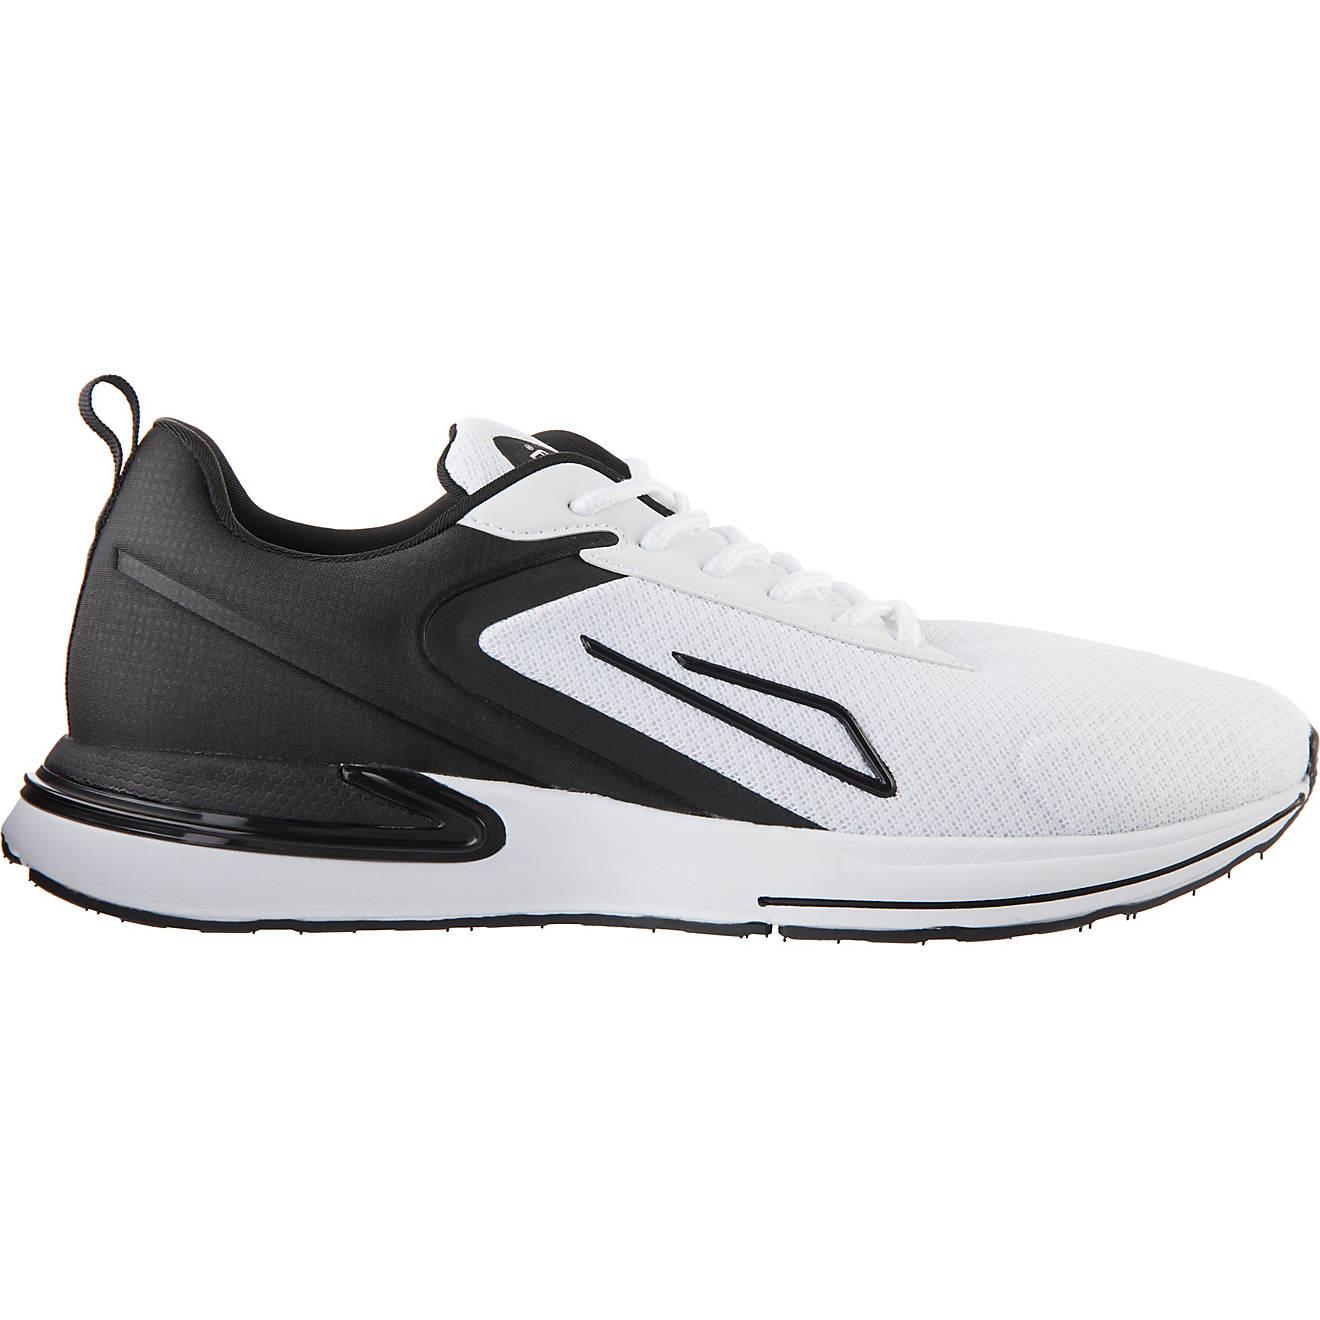 BCG Exertion Men's Training Shoes